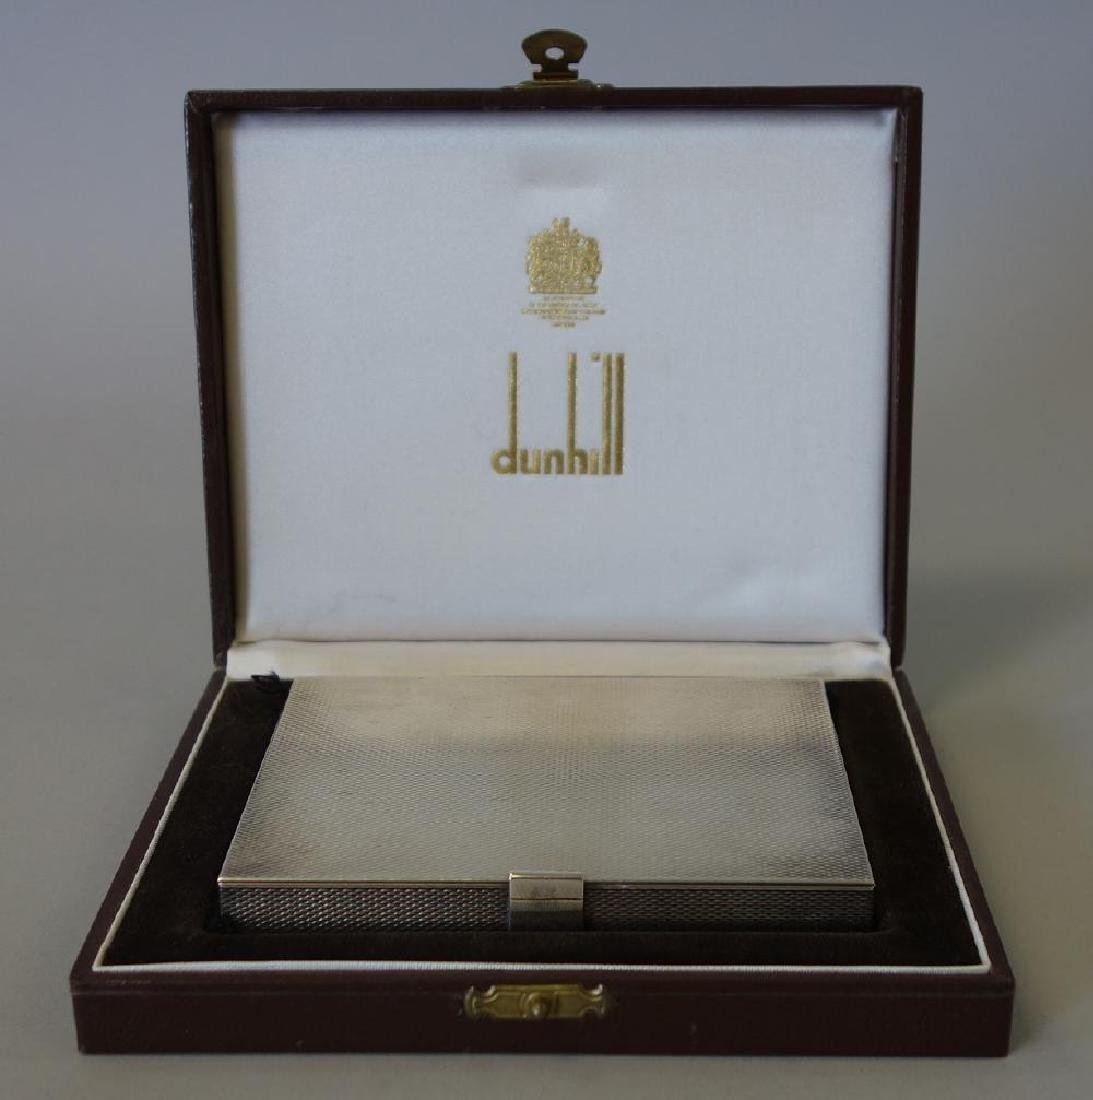 Dunhill, Paris Cigarette Case w/ Presentation Box